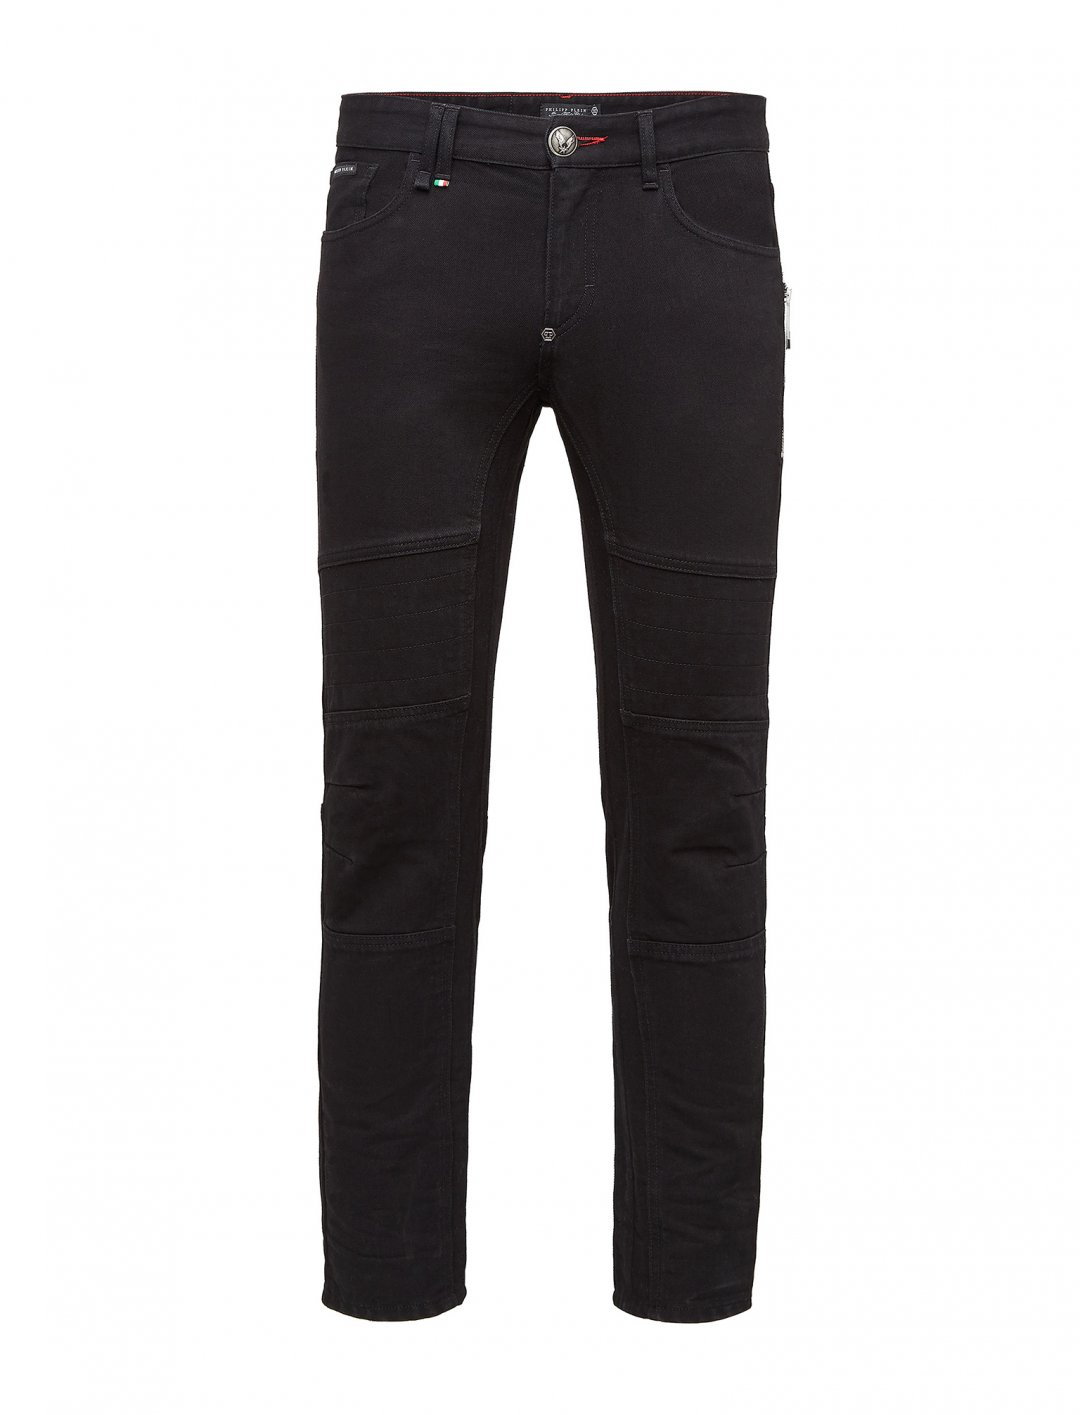 "Mikolas Josef's Biker Jeans {""id"":5,""product_section_id"":1,""name"":""Clothing"",""order"":5} Philipp Plein"